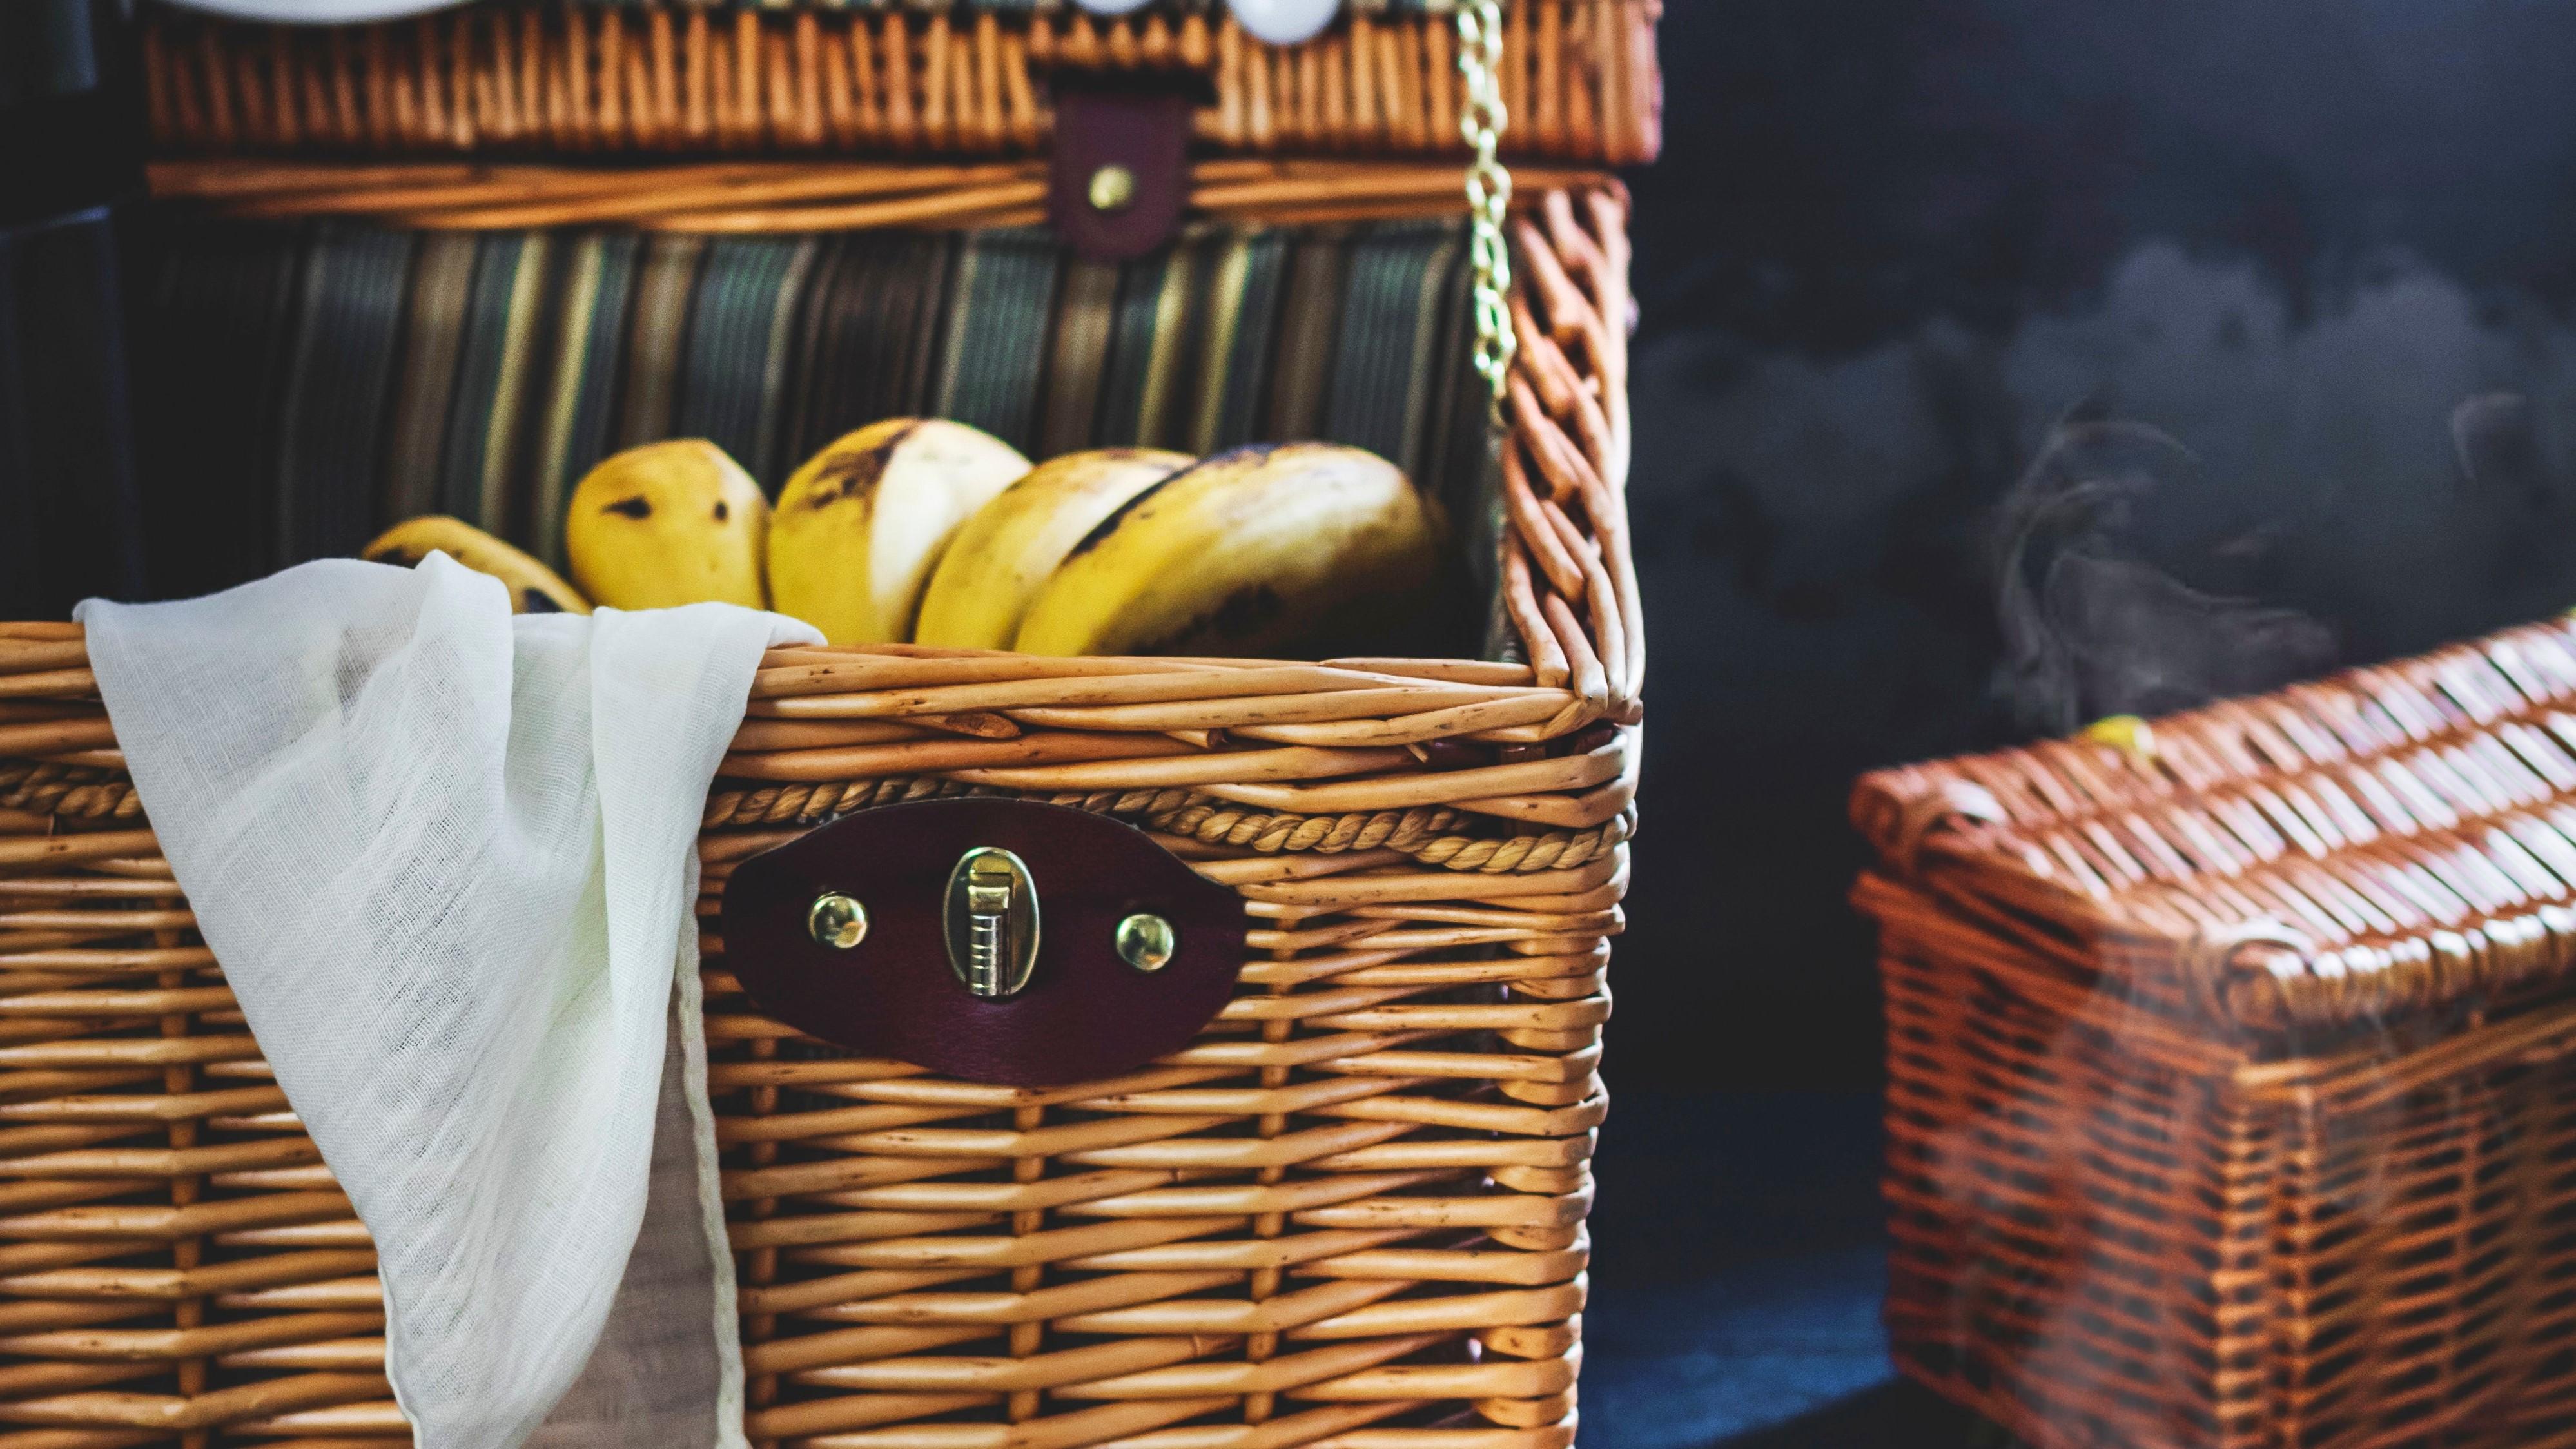 The perfect Madeira's picnic hamper